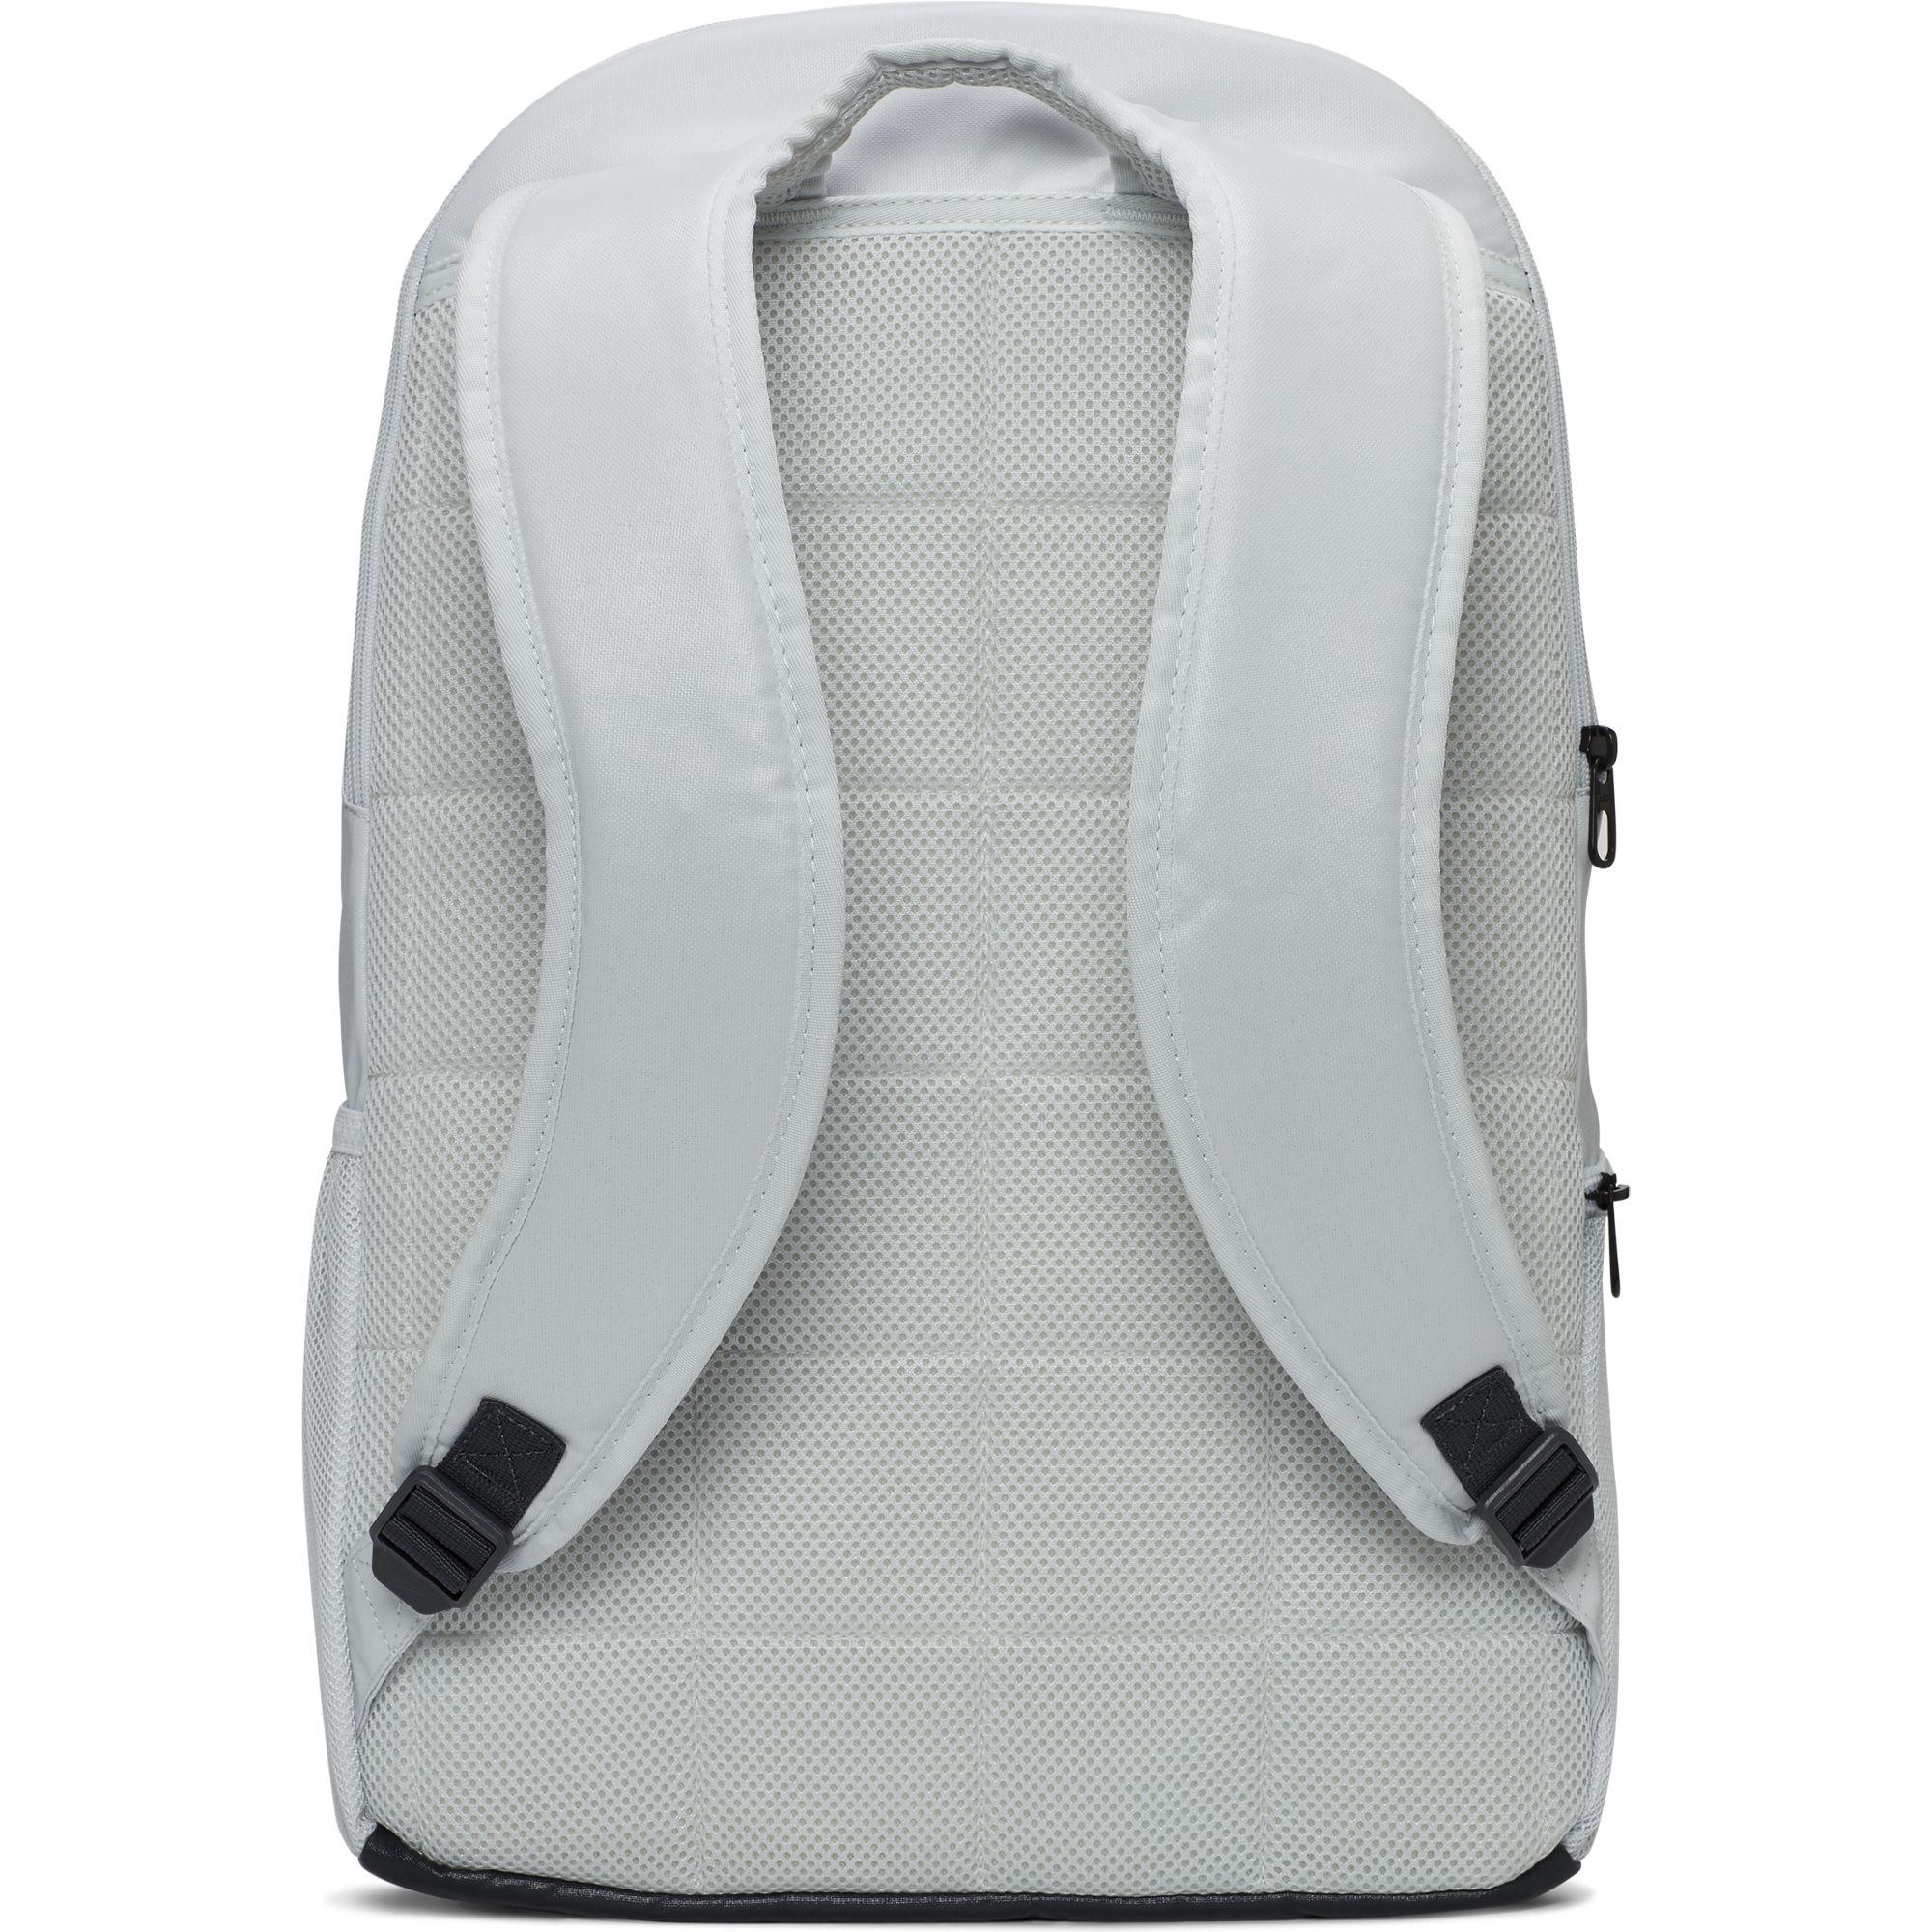 Brasilia XL Backpack, Sand/White, swatch